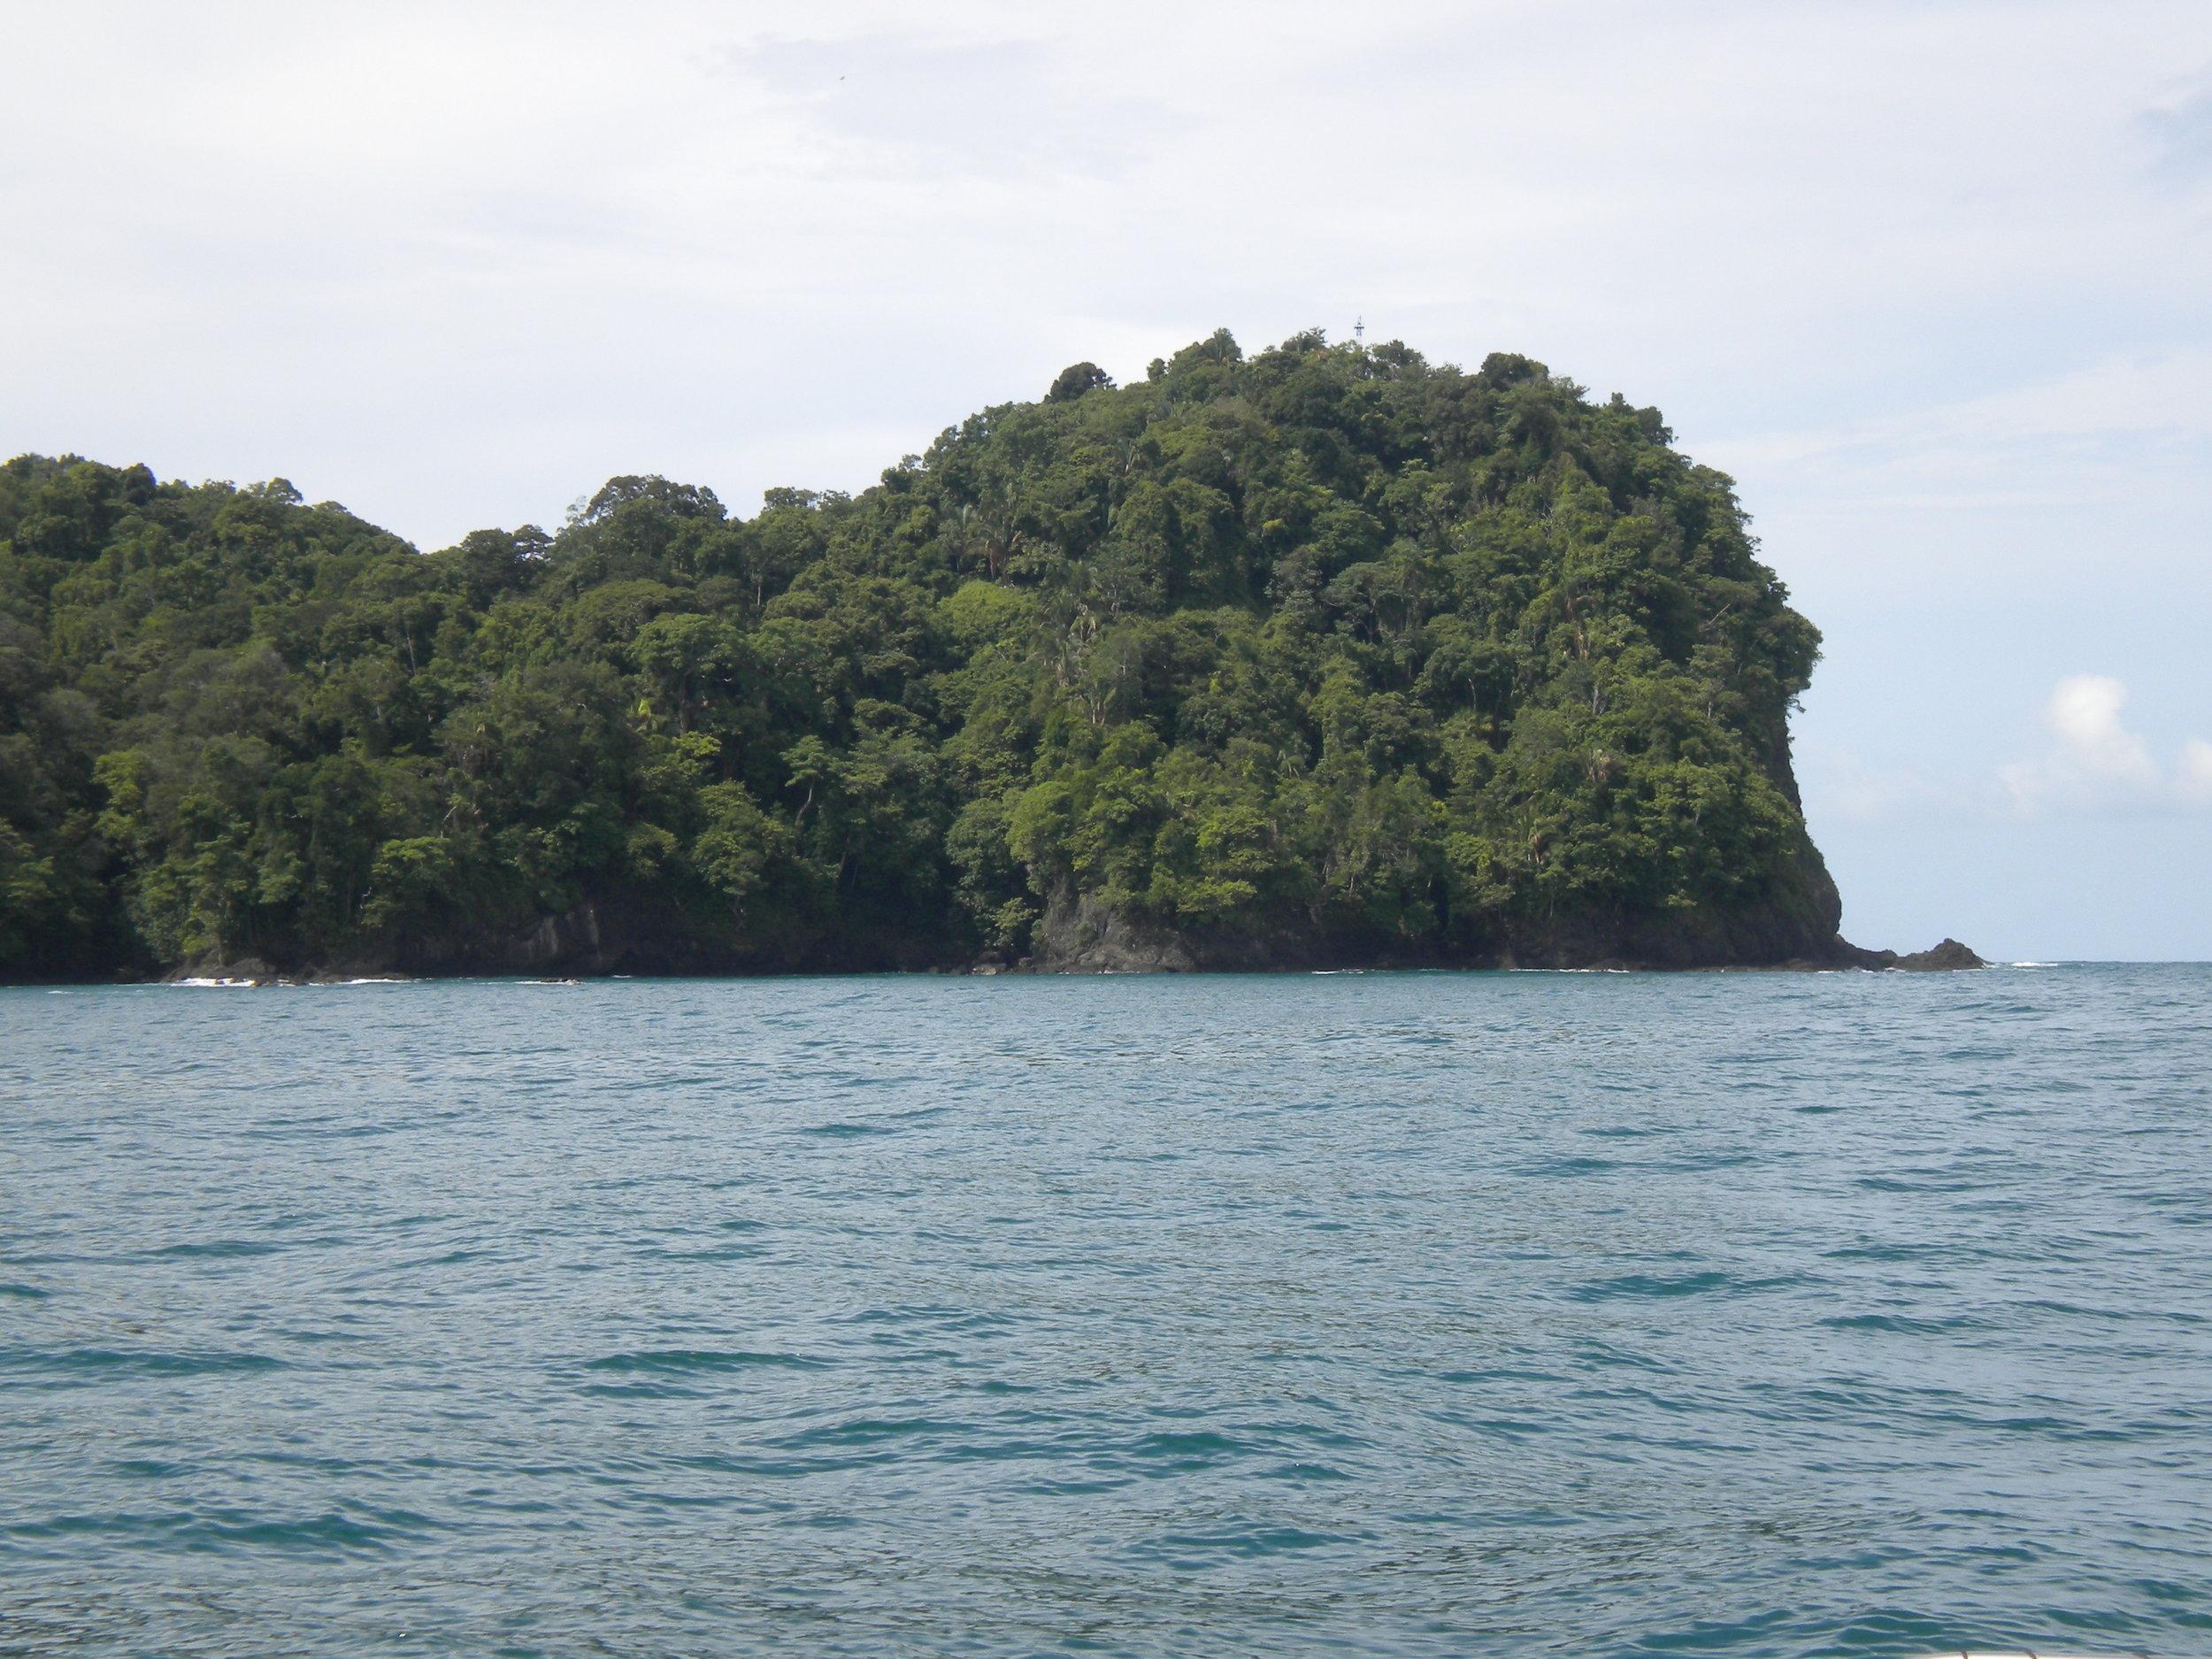 Costa Pacífica, Quepos, Costa Rica